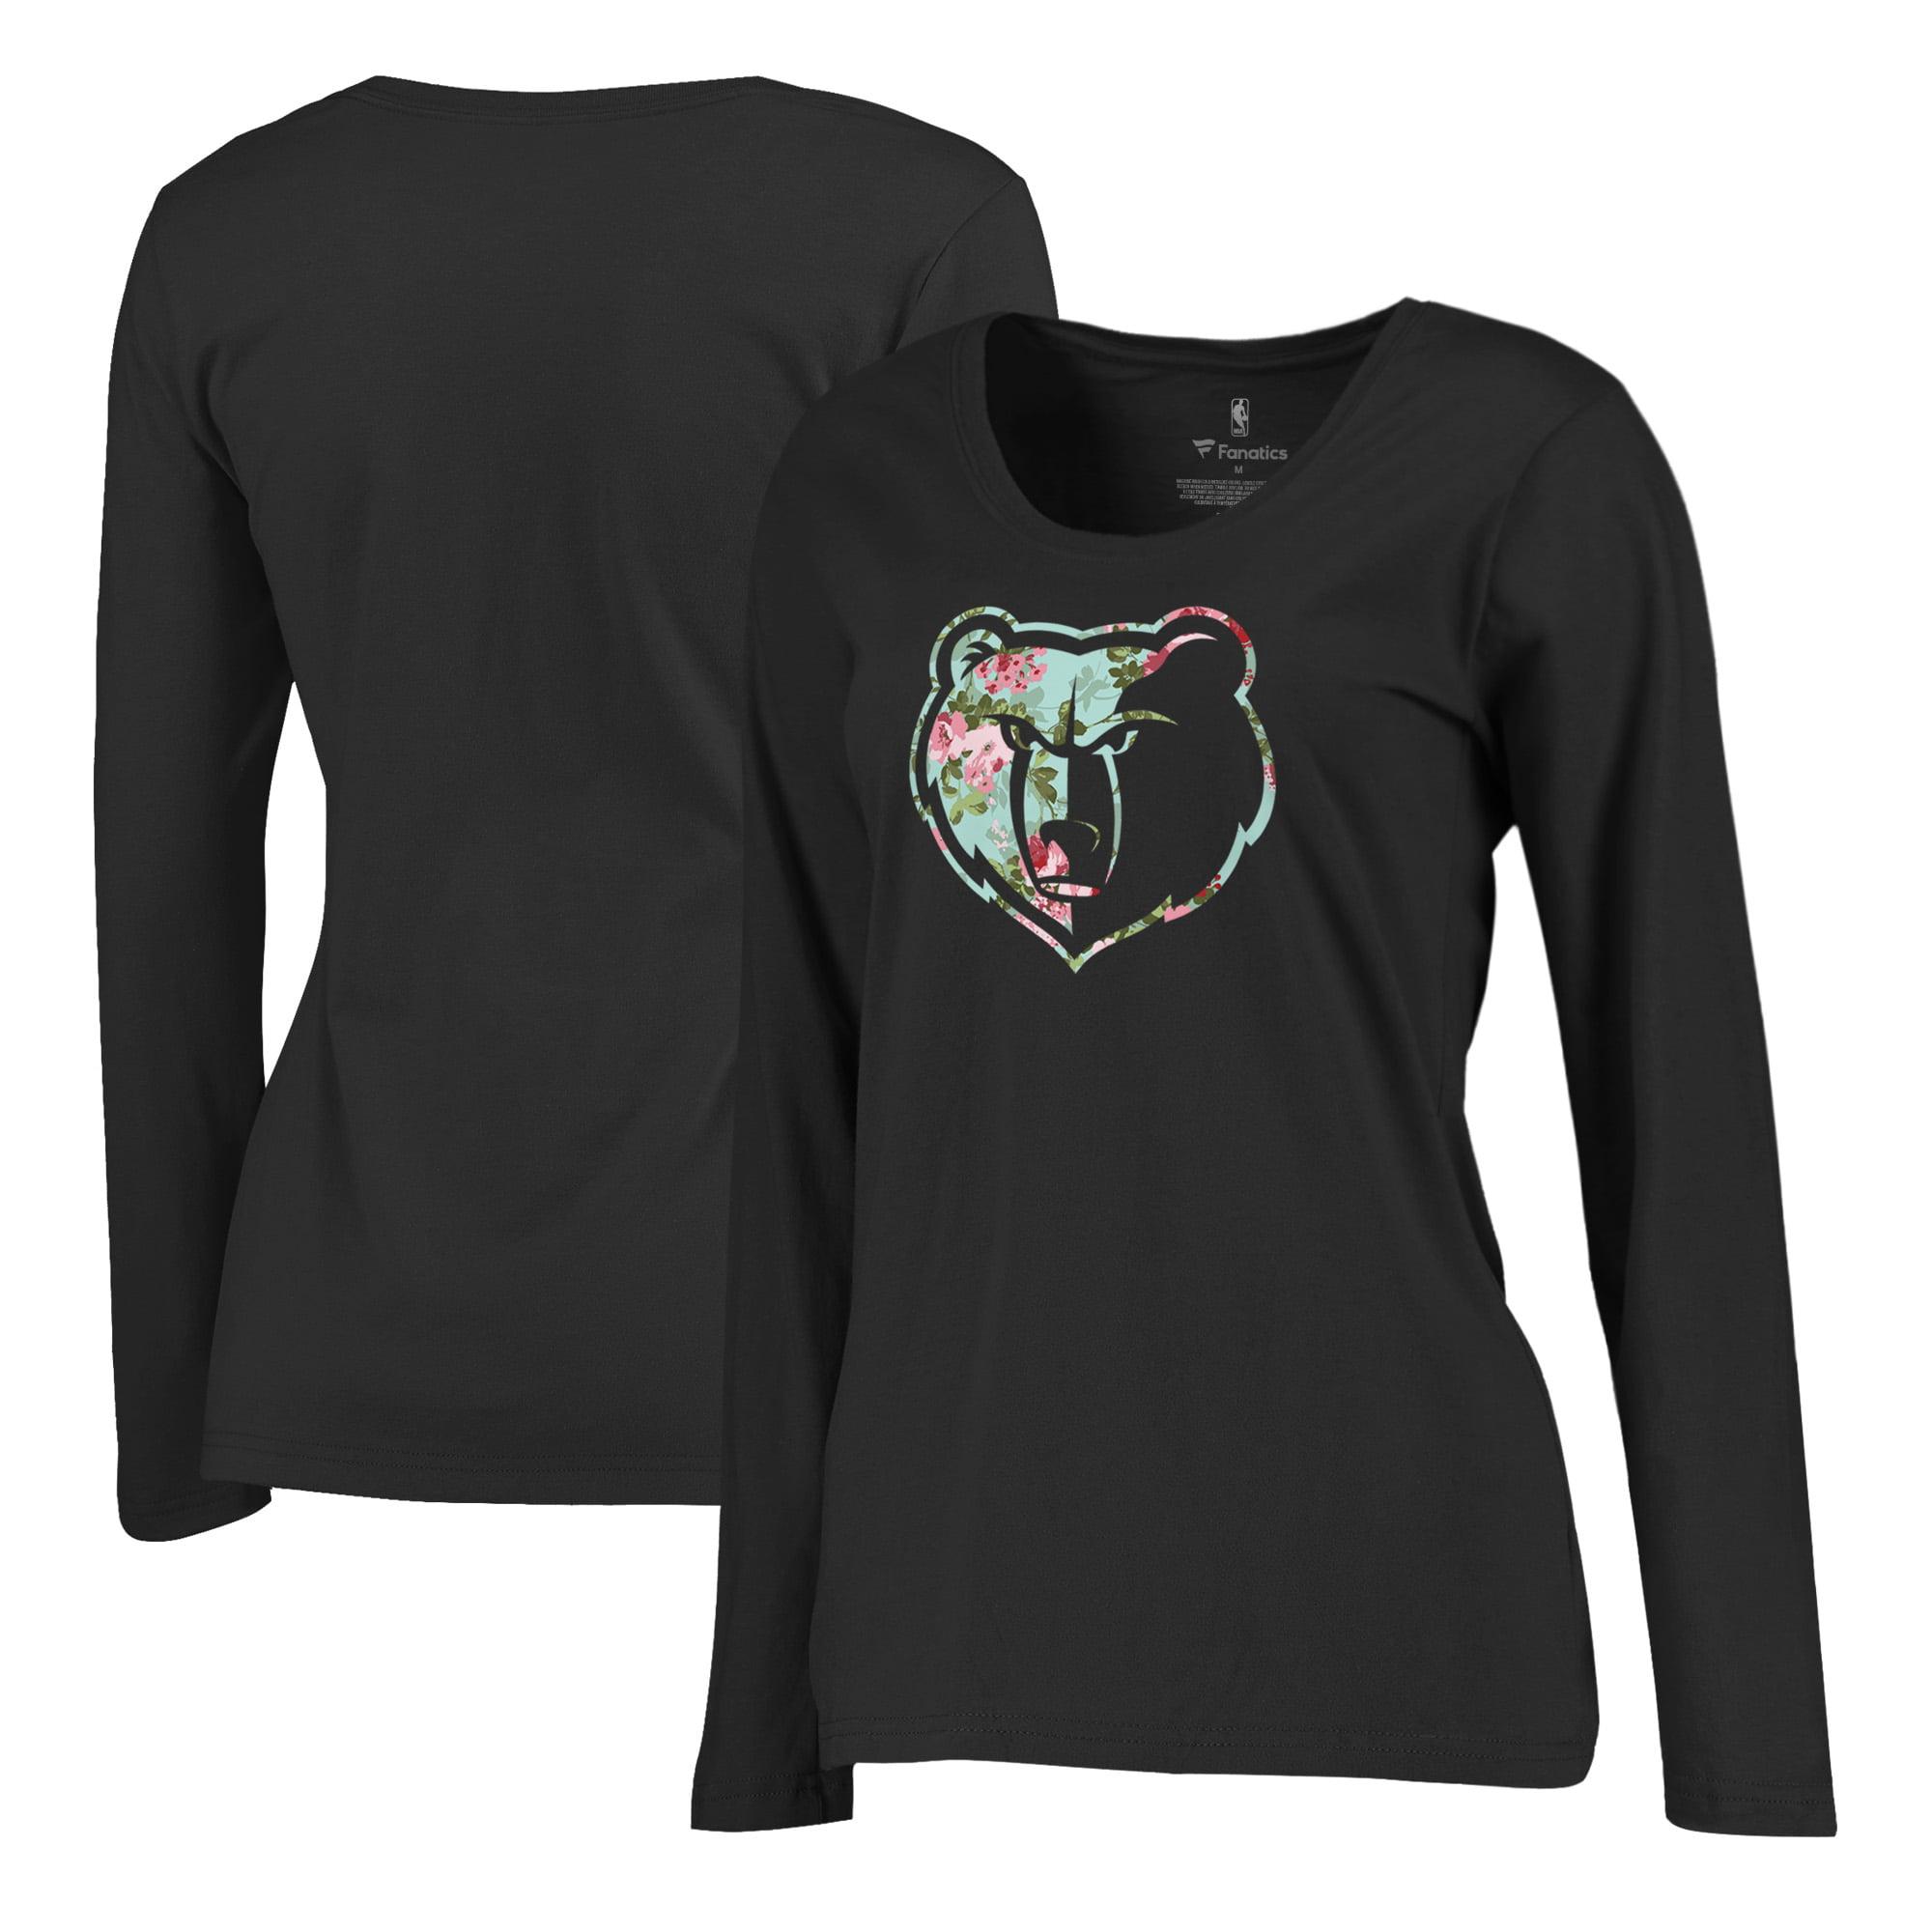 Memphis Grizzlies Fanatics Branded Women's Lovely Plus Size Long Sleeve V-Neck T-Shirt - Black